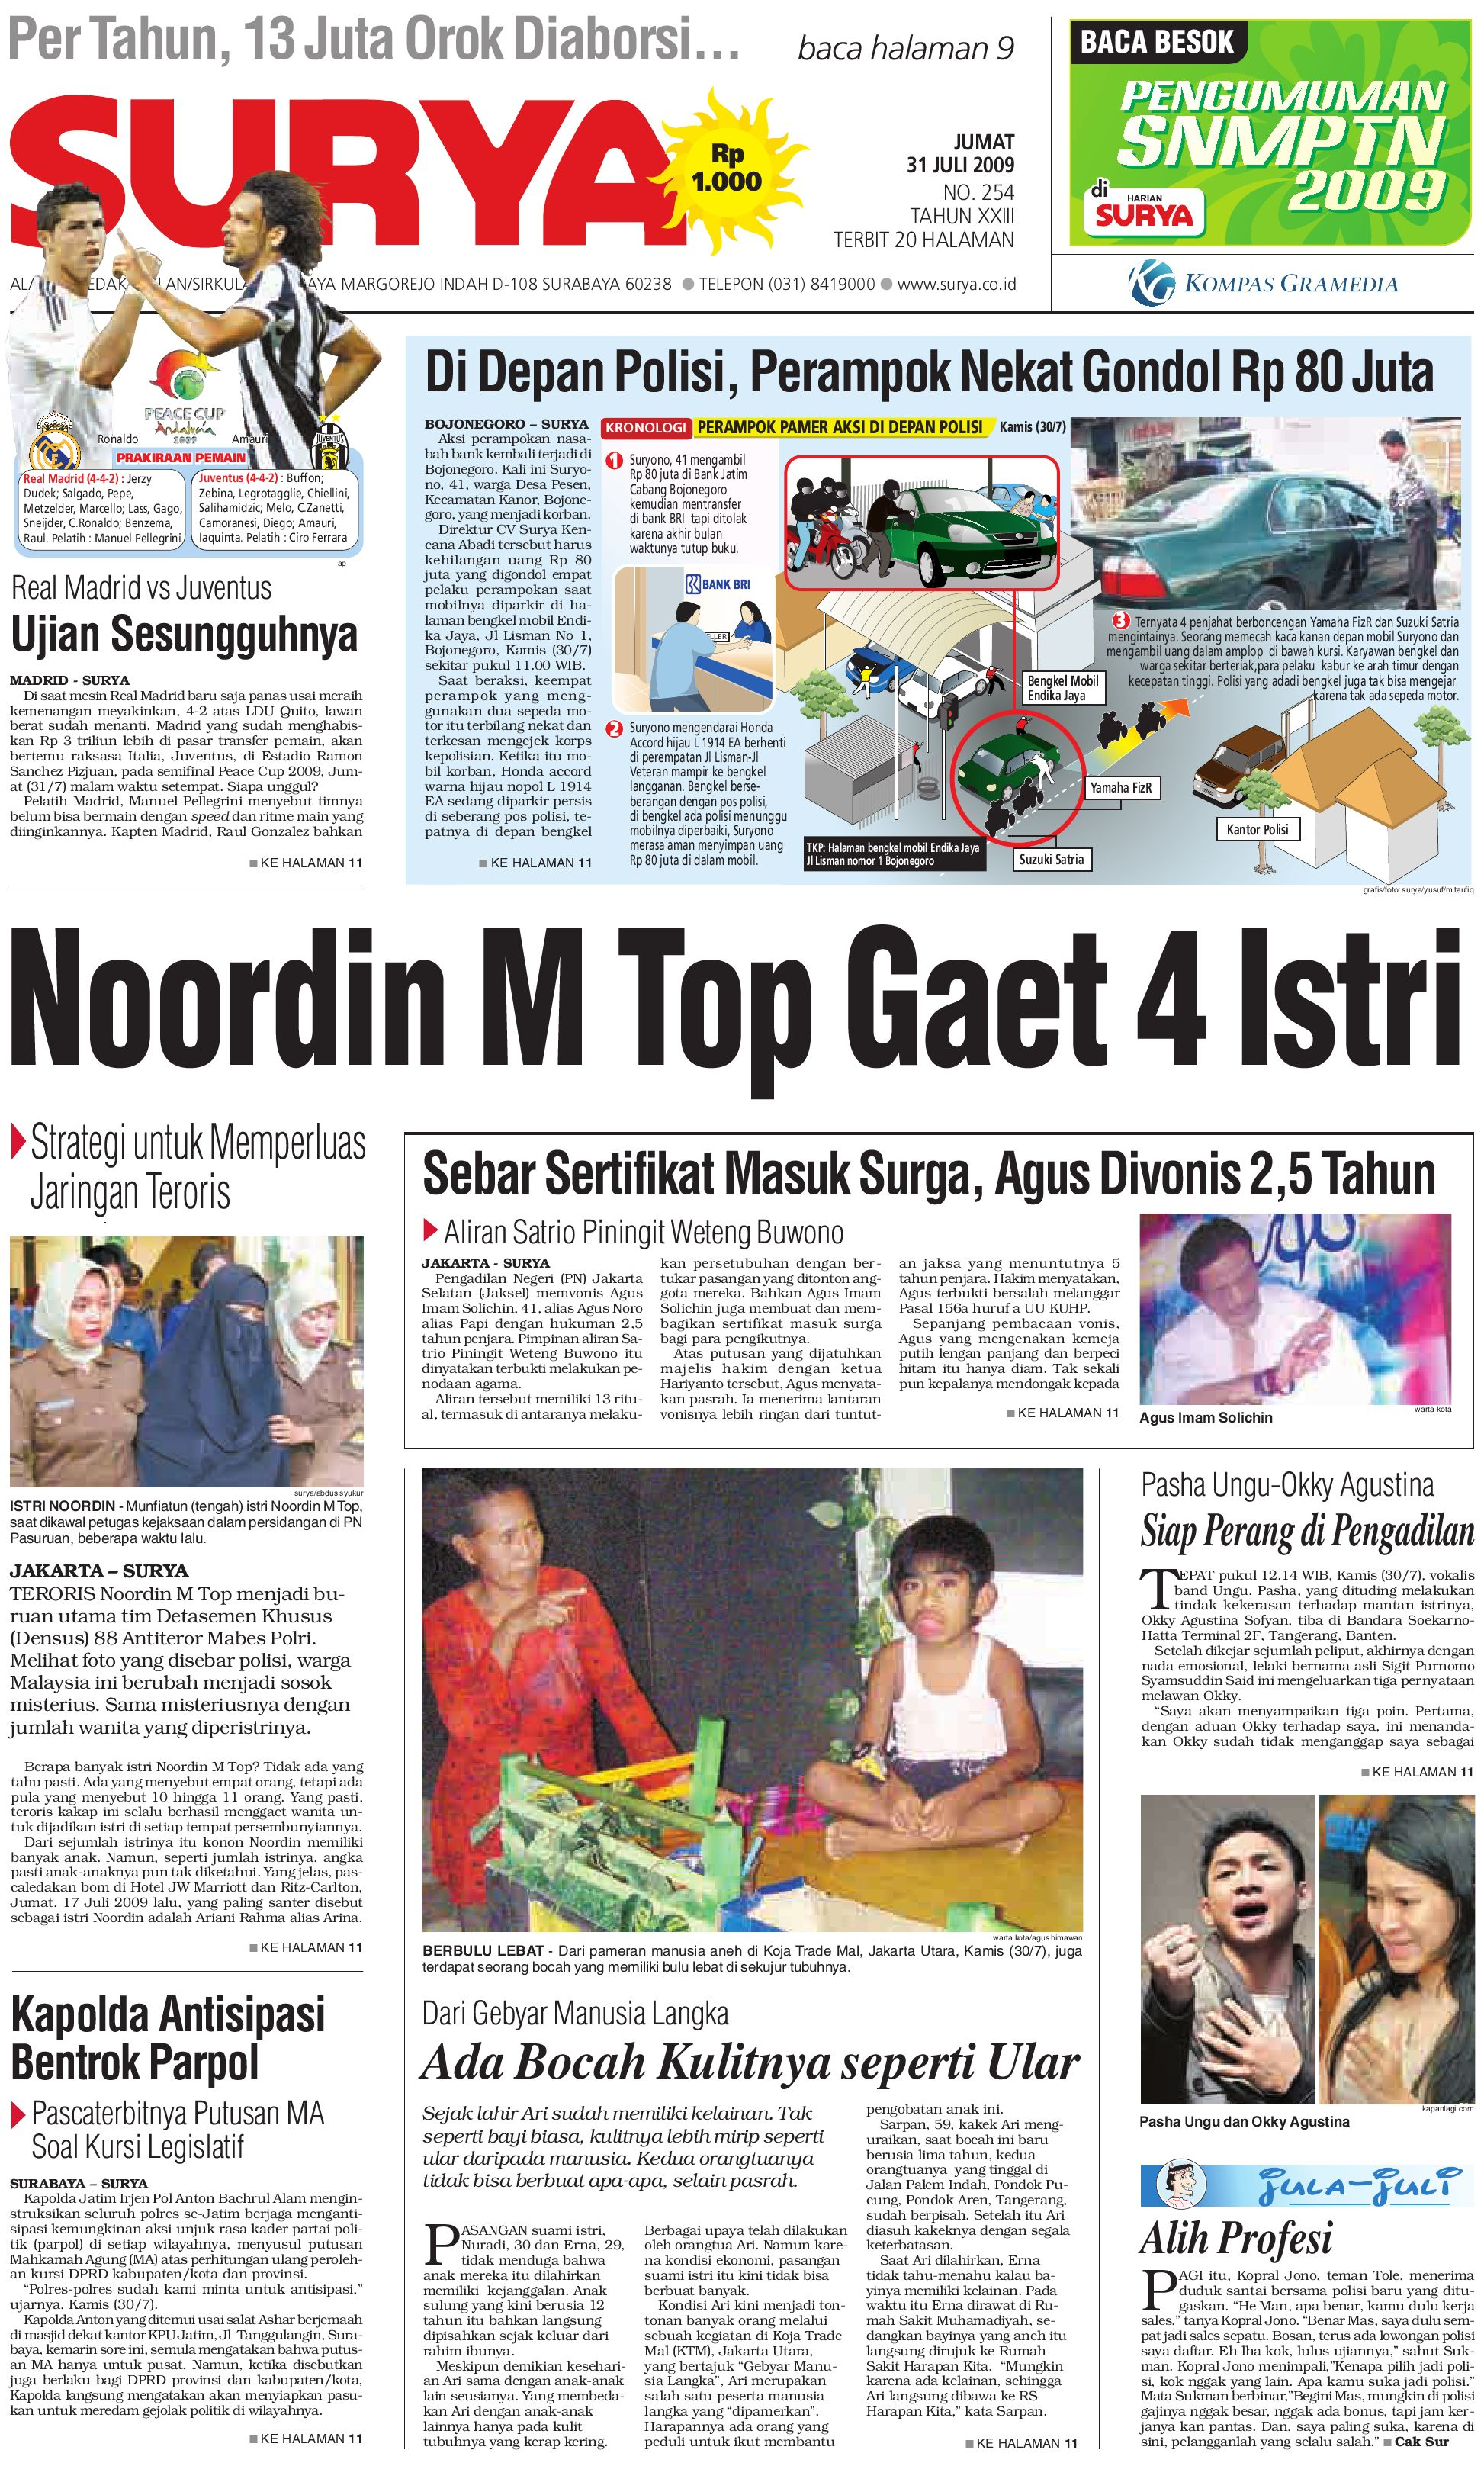 Surya Edisi Cetak 31 Juli 2009 by Harian SURYA - issuu c72d49a10c